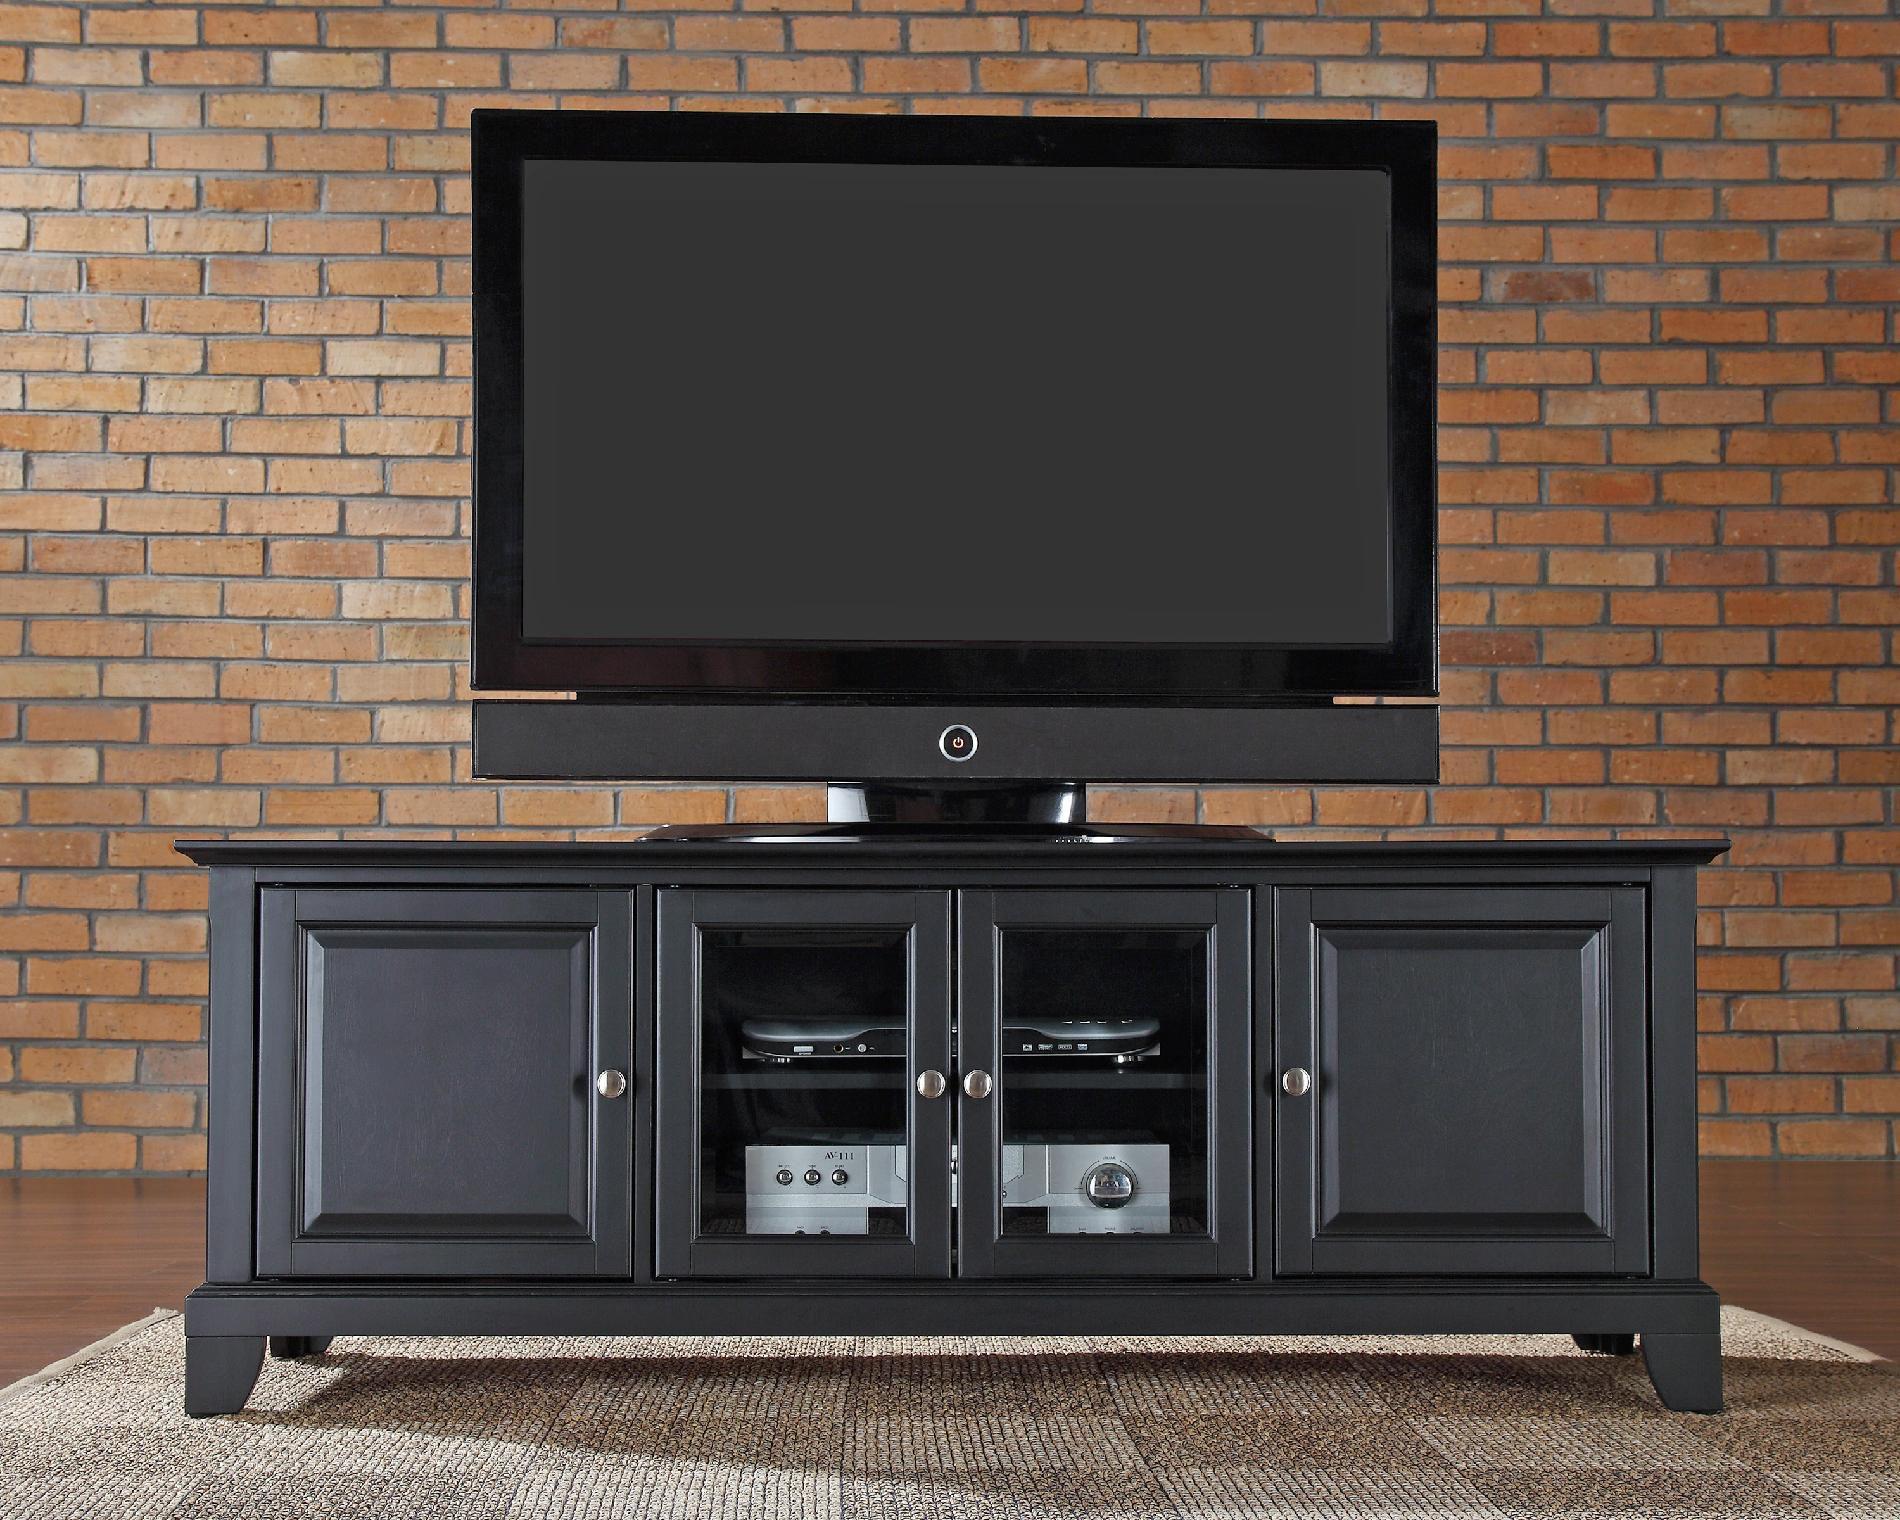 Crosley Furniture Newport 60in Low Profile TV Stand in Black